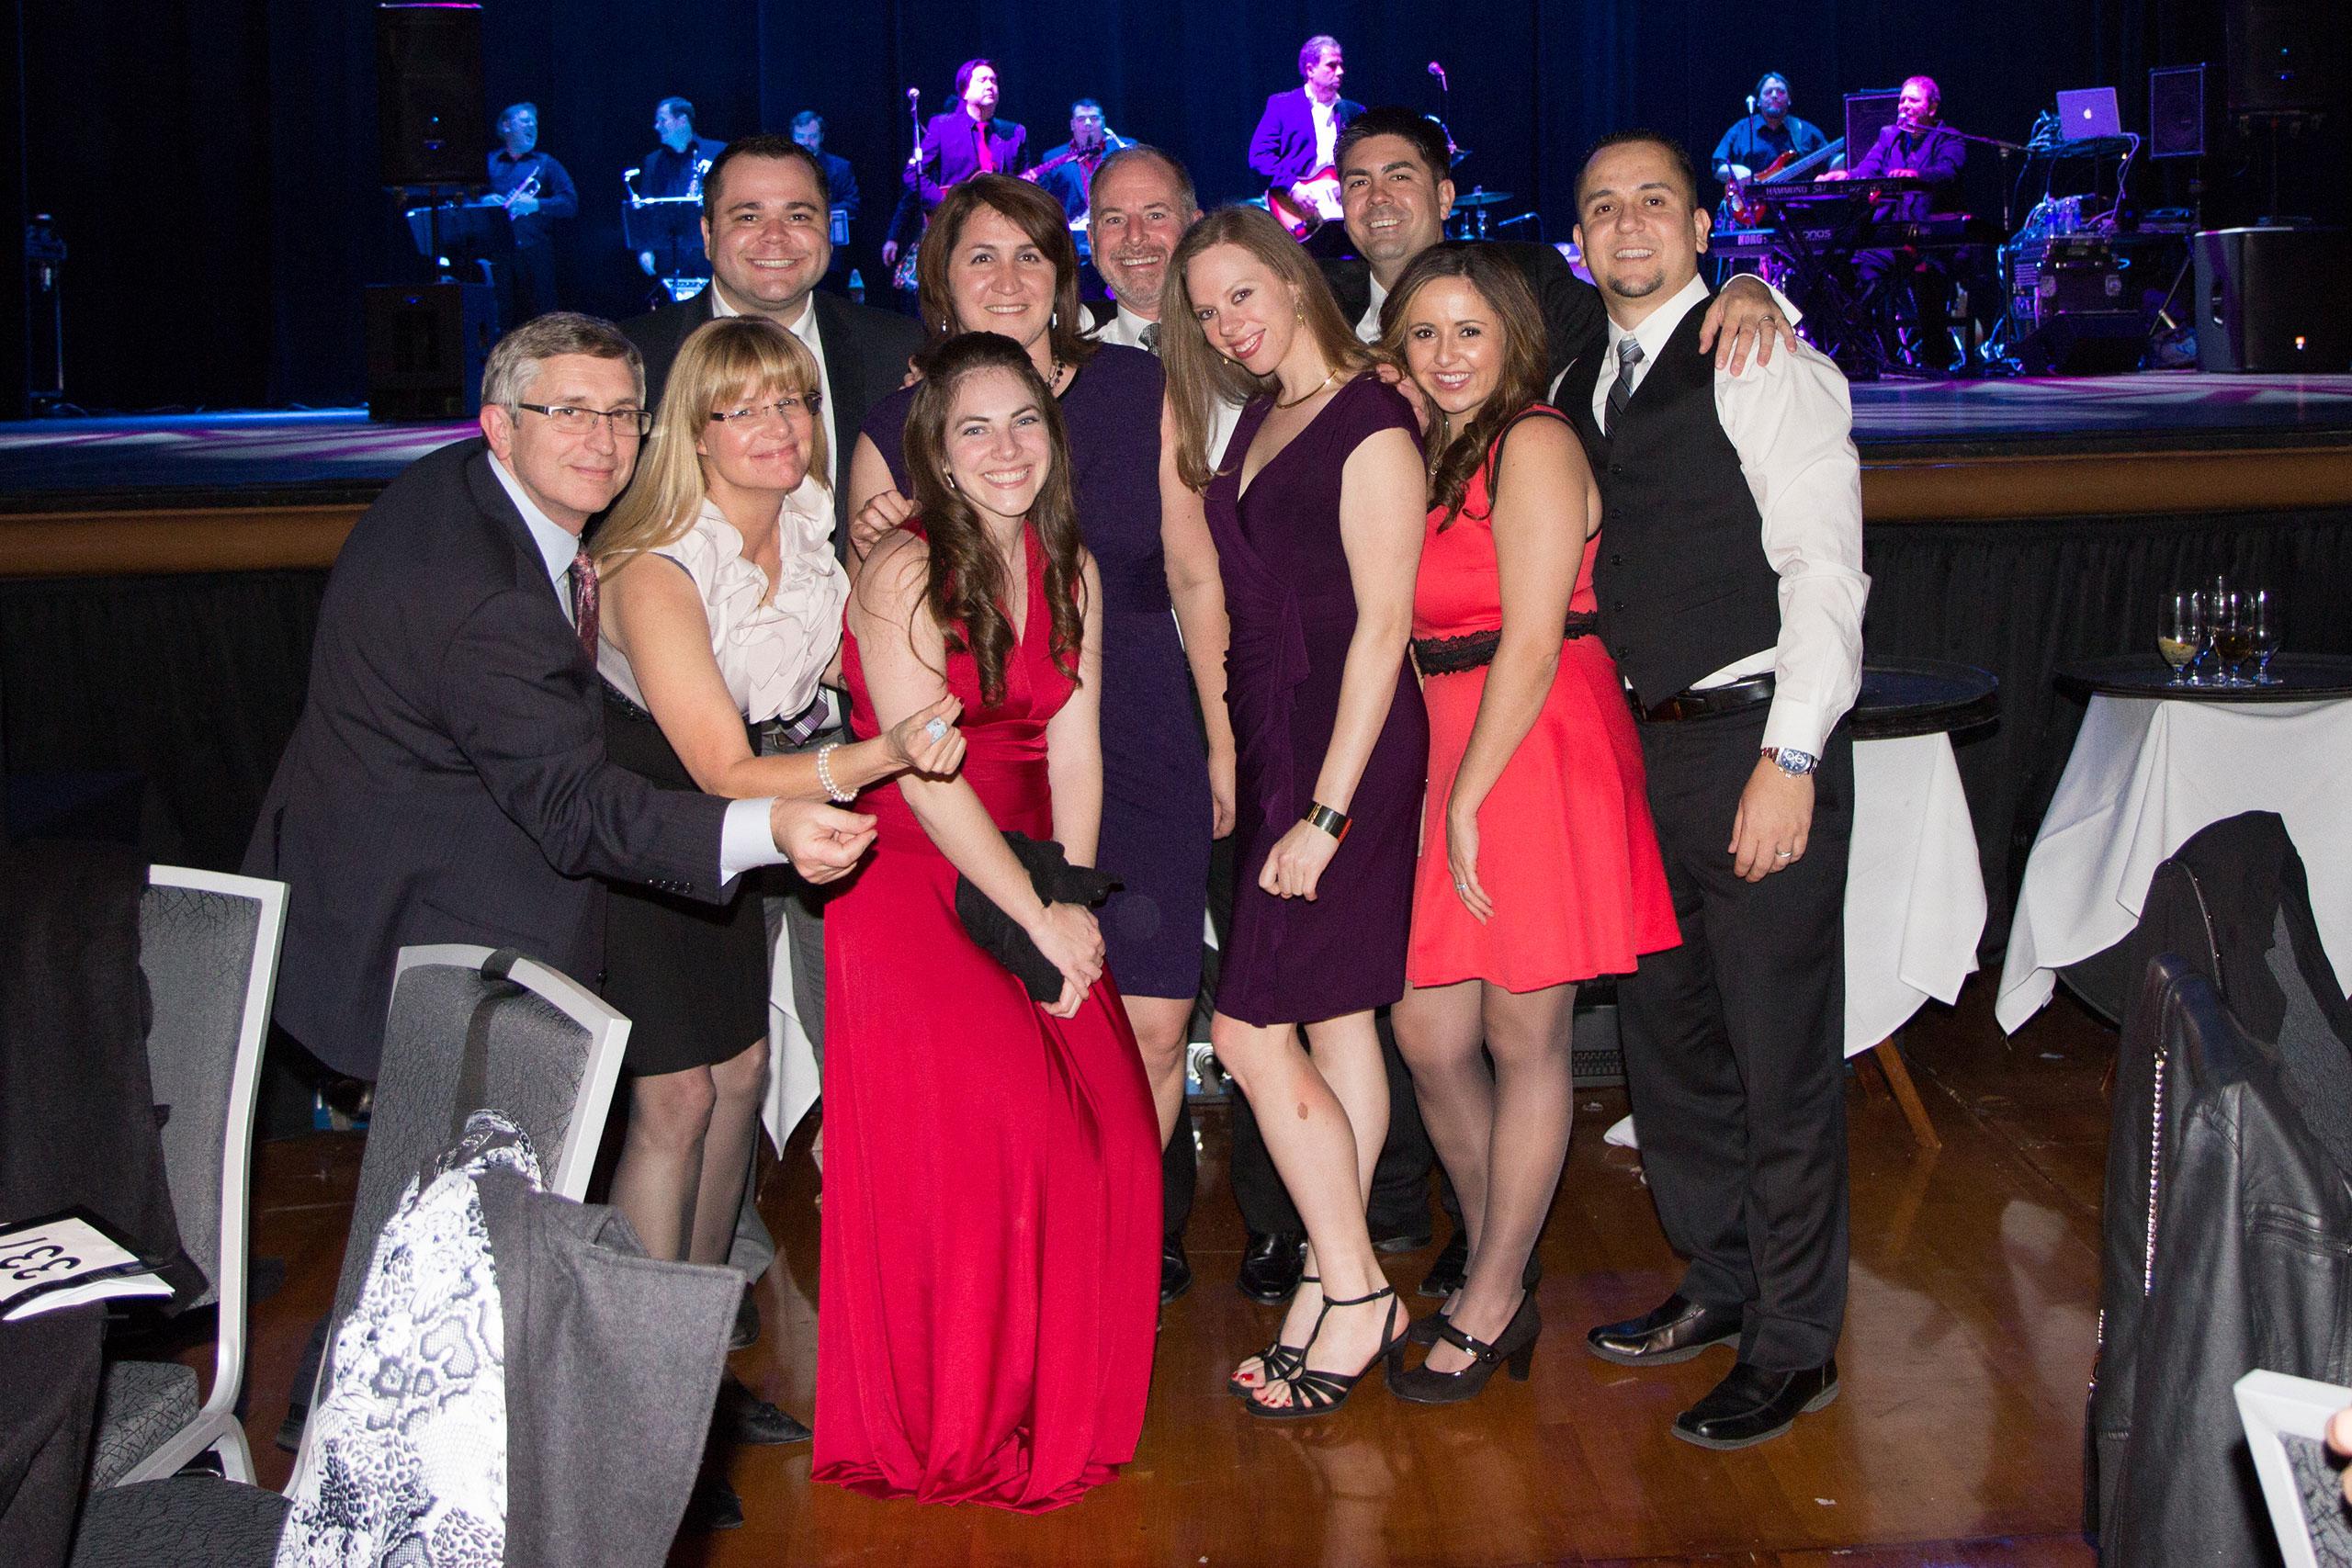 Bob, Yvette, Matt, Jessica, Cristina, John, Caroline, Scott, Veronica and Manny Supporting Children's Musical Theater